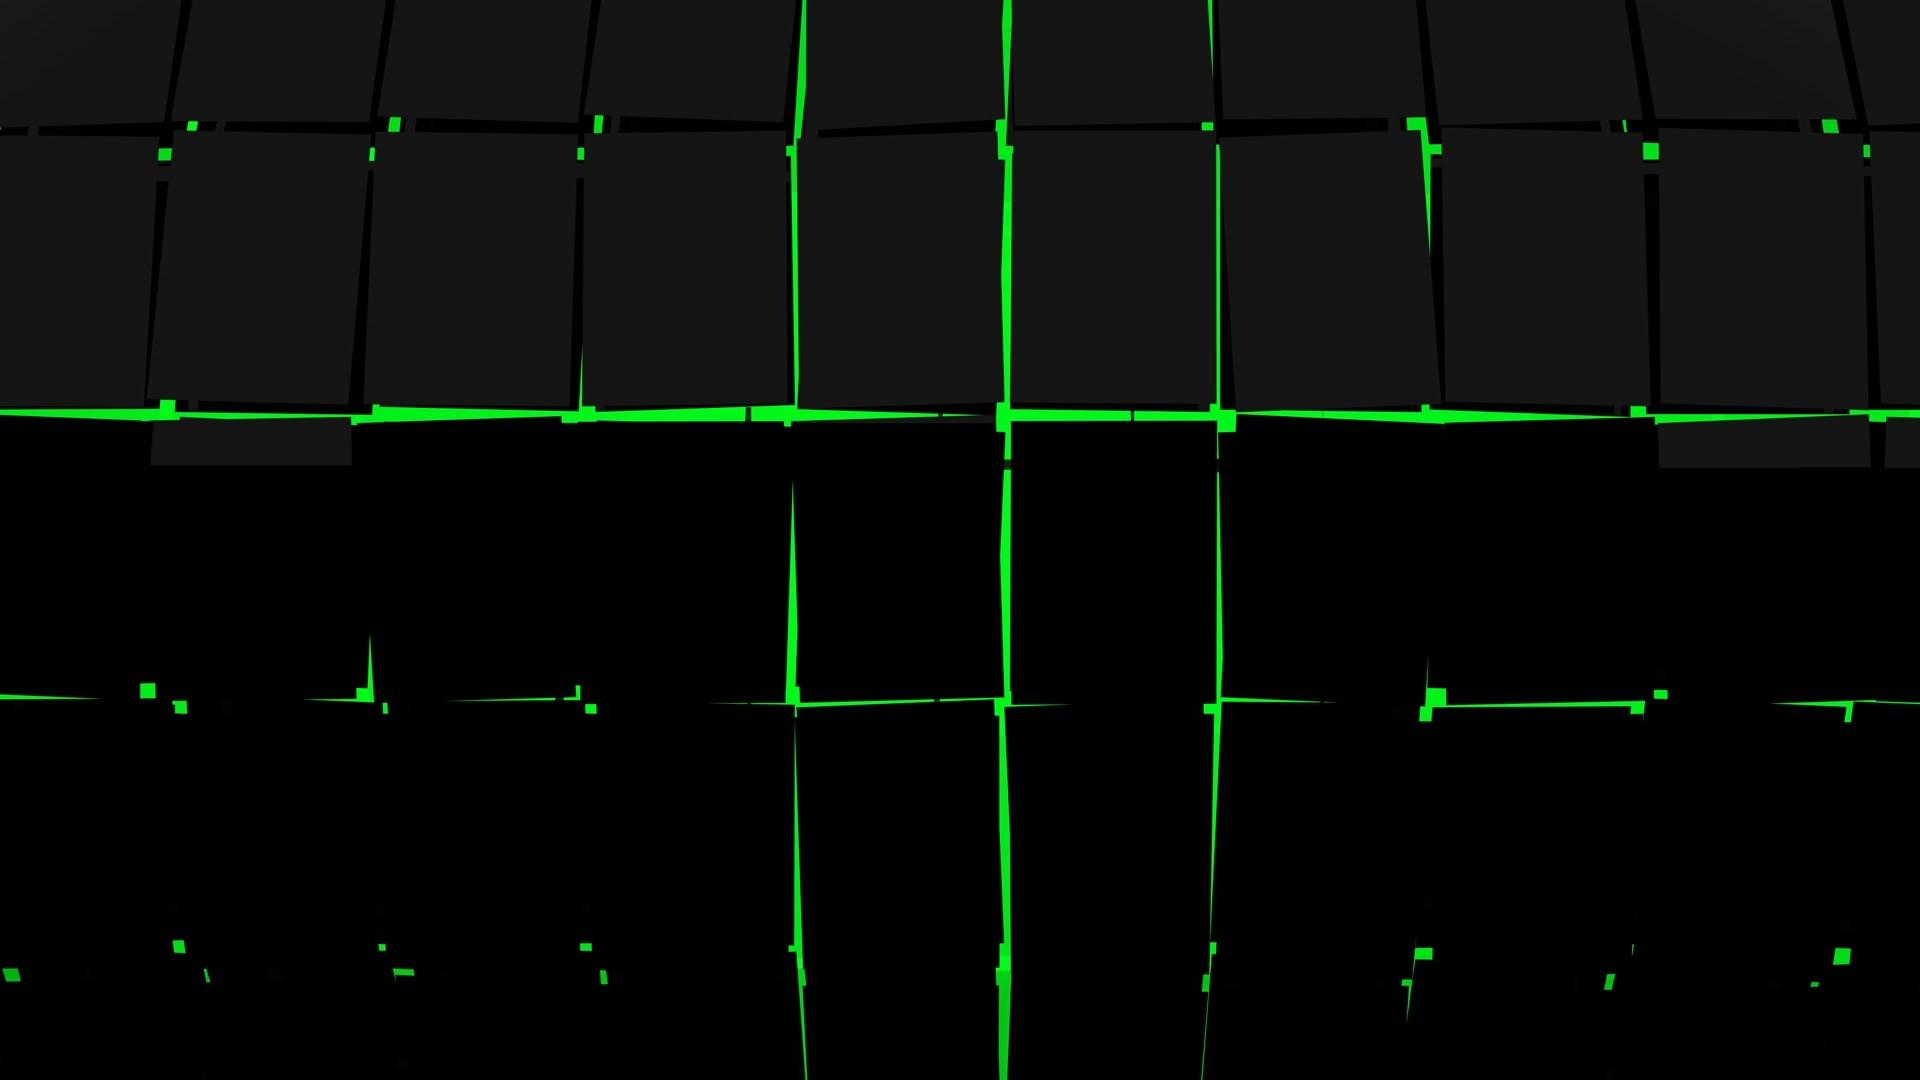 Green Grass HD Wallpapers : Find best latest Green Grass HD Wallpapers for  your PC desktop background & mobile phones.   hd wallpaper   Pinterest    Green …